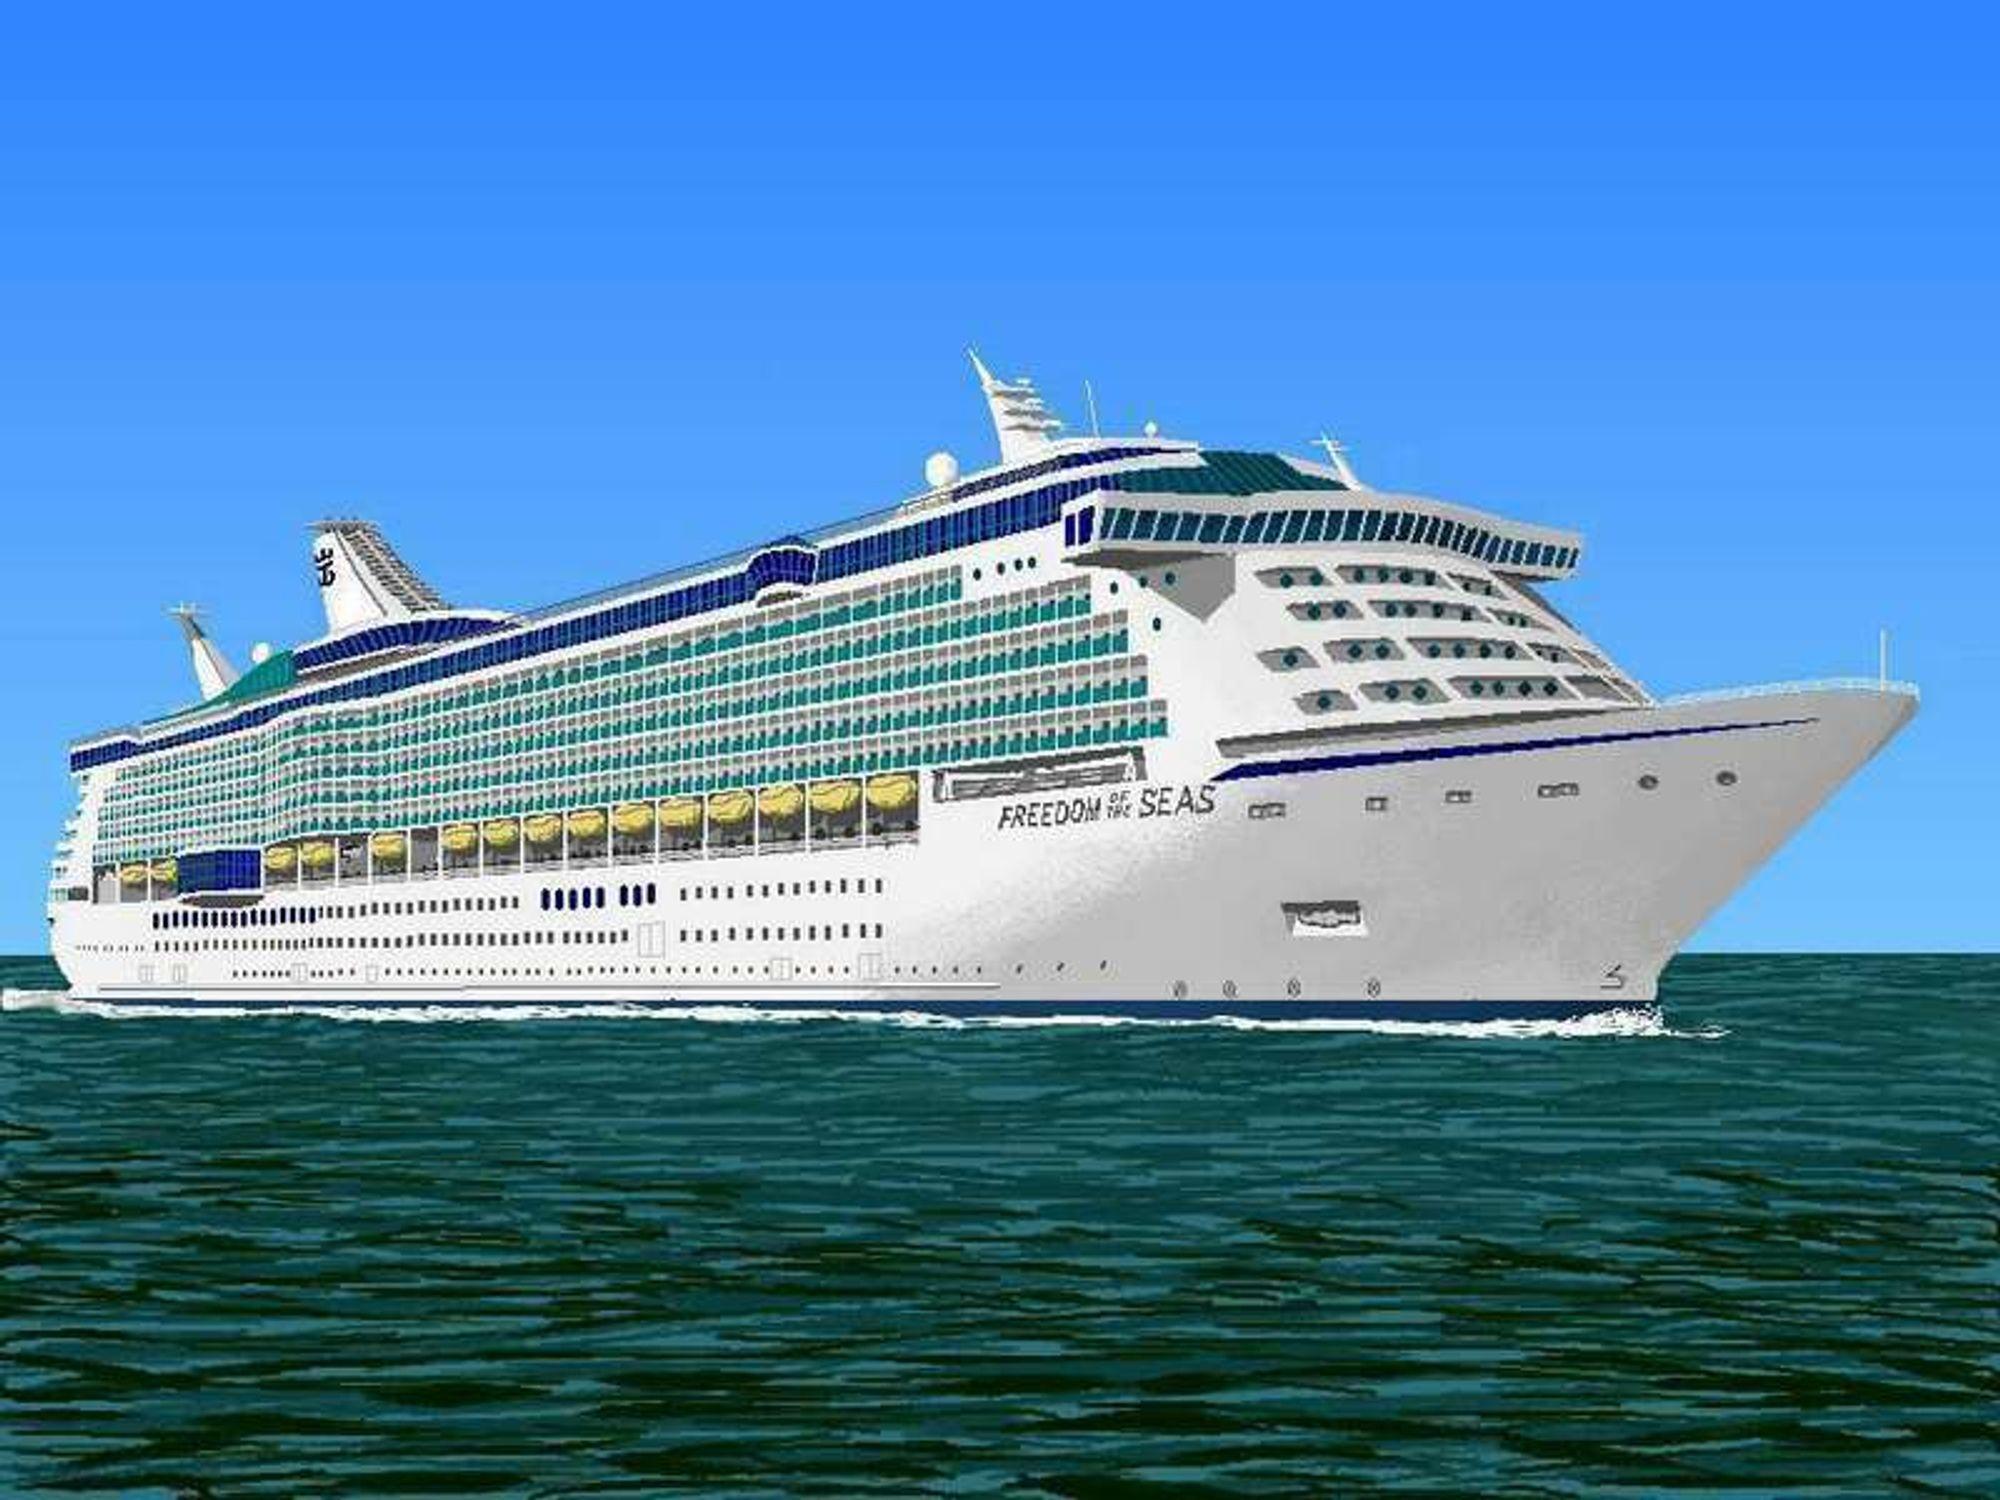 NY GIGANTBESTILLING: Royal Caribbeans har bestilt nok et skip fra Aker Yards. Her er første skip i klassen Freedom of the Seas, bygget ved tidligere Aker Kværner i Finland.